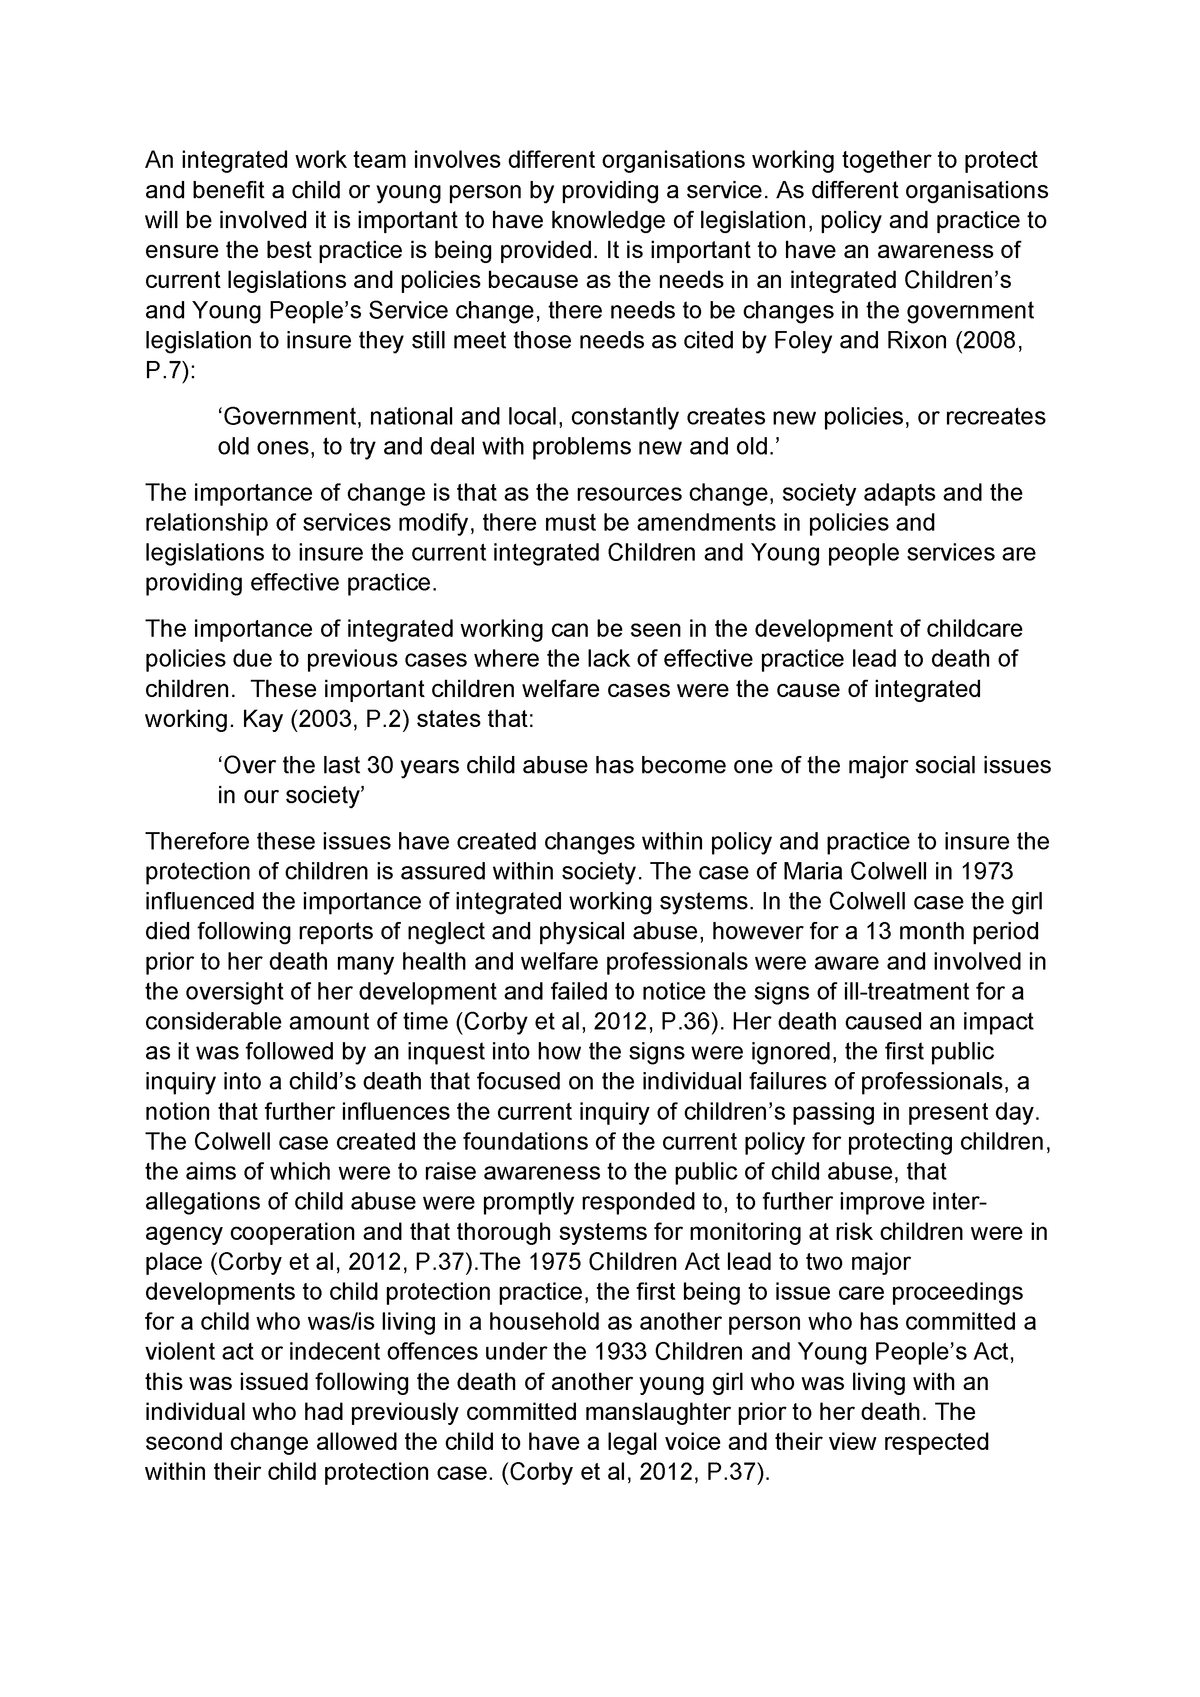 Personal ethics vs professional ethics essay